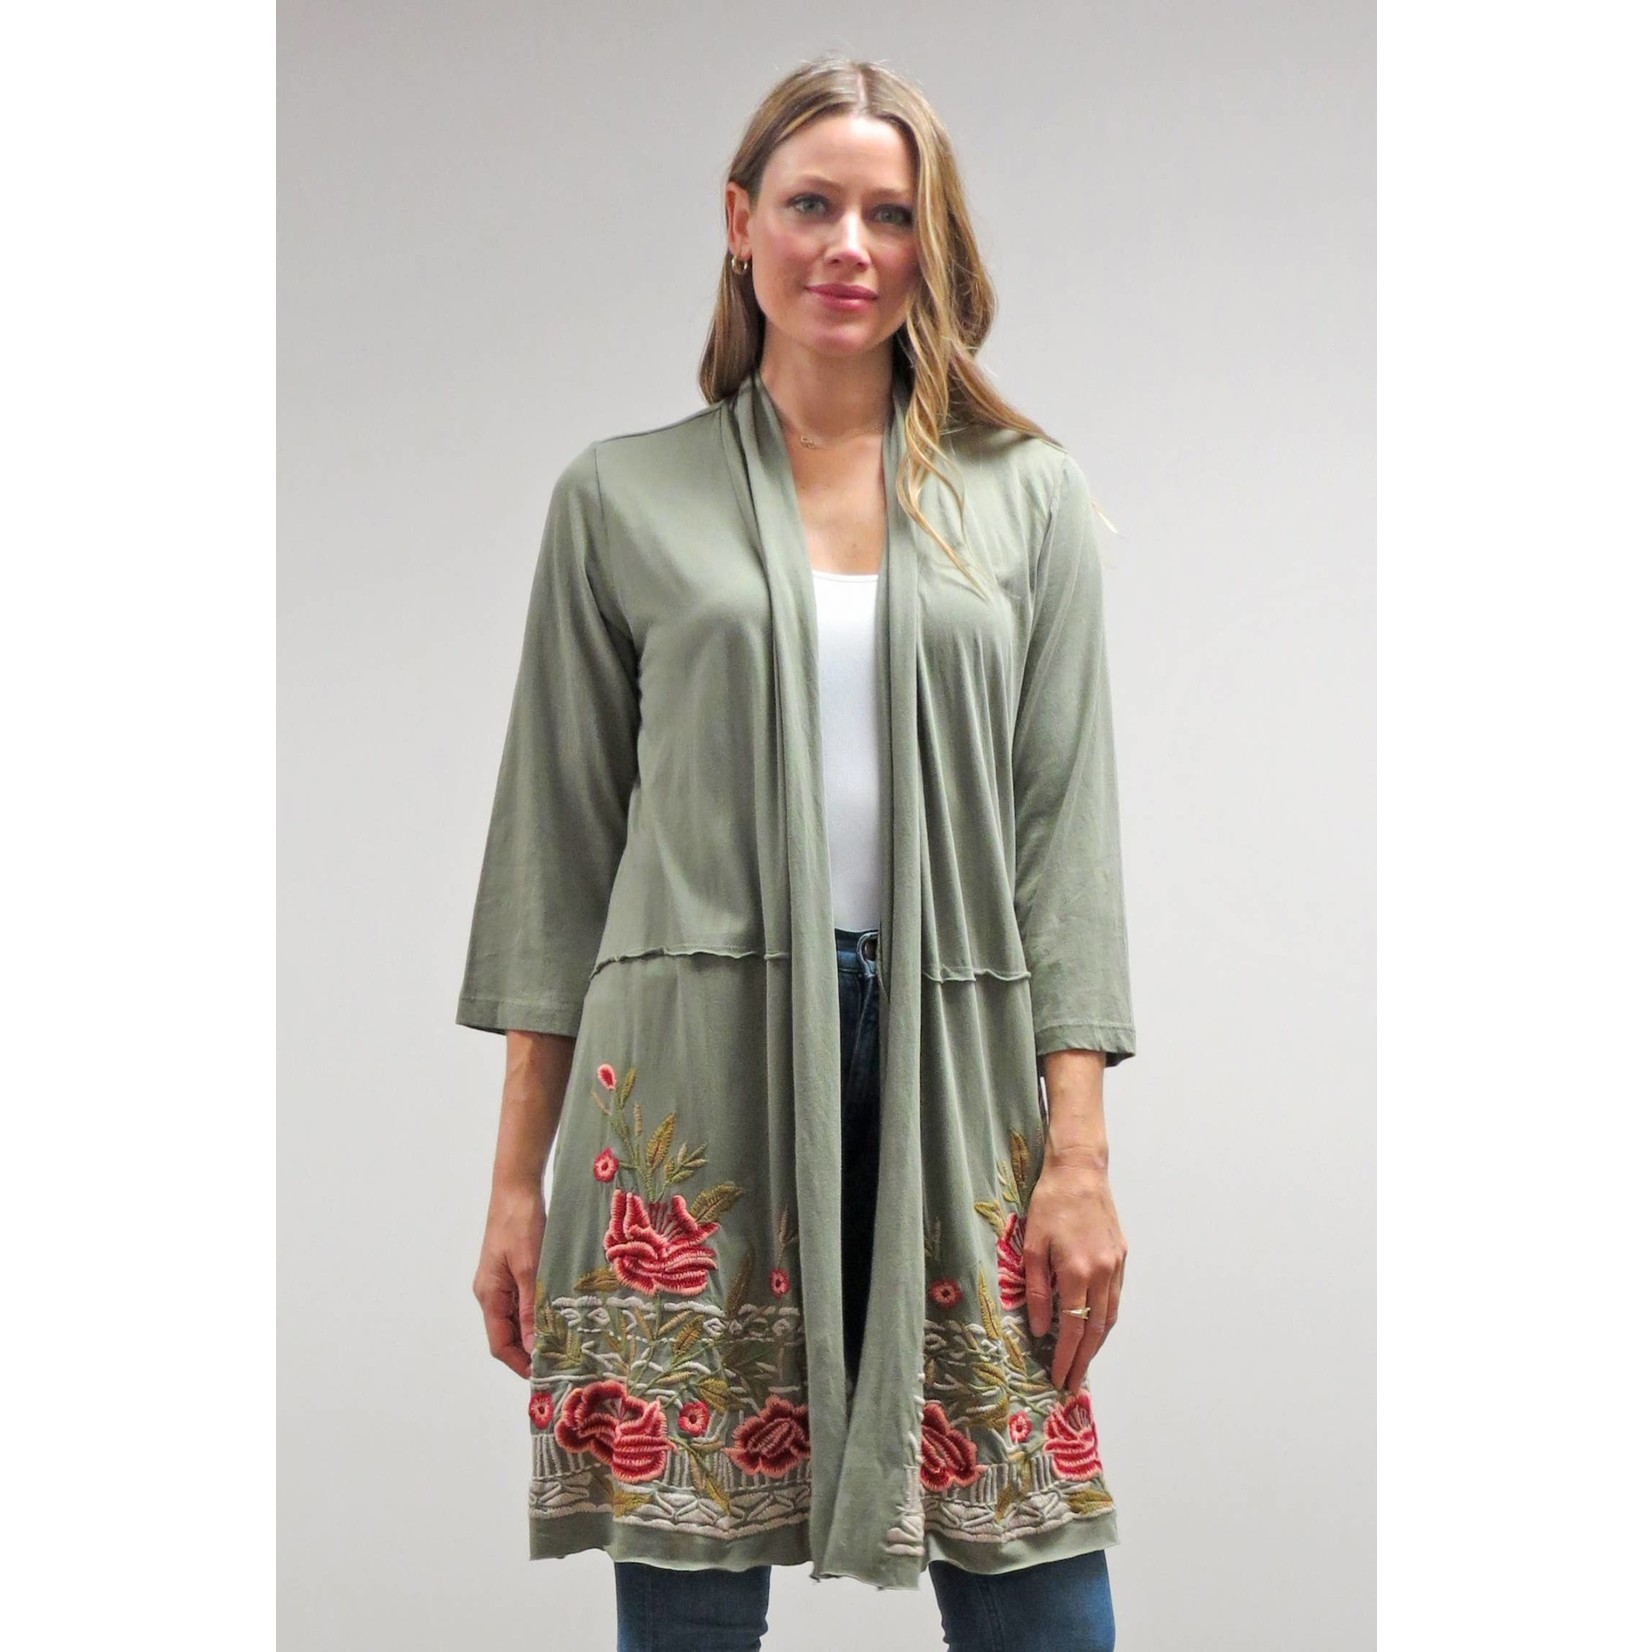 Caite Reese 3/ Slv Embr Bottom Jacket in Vintage Green